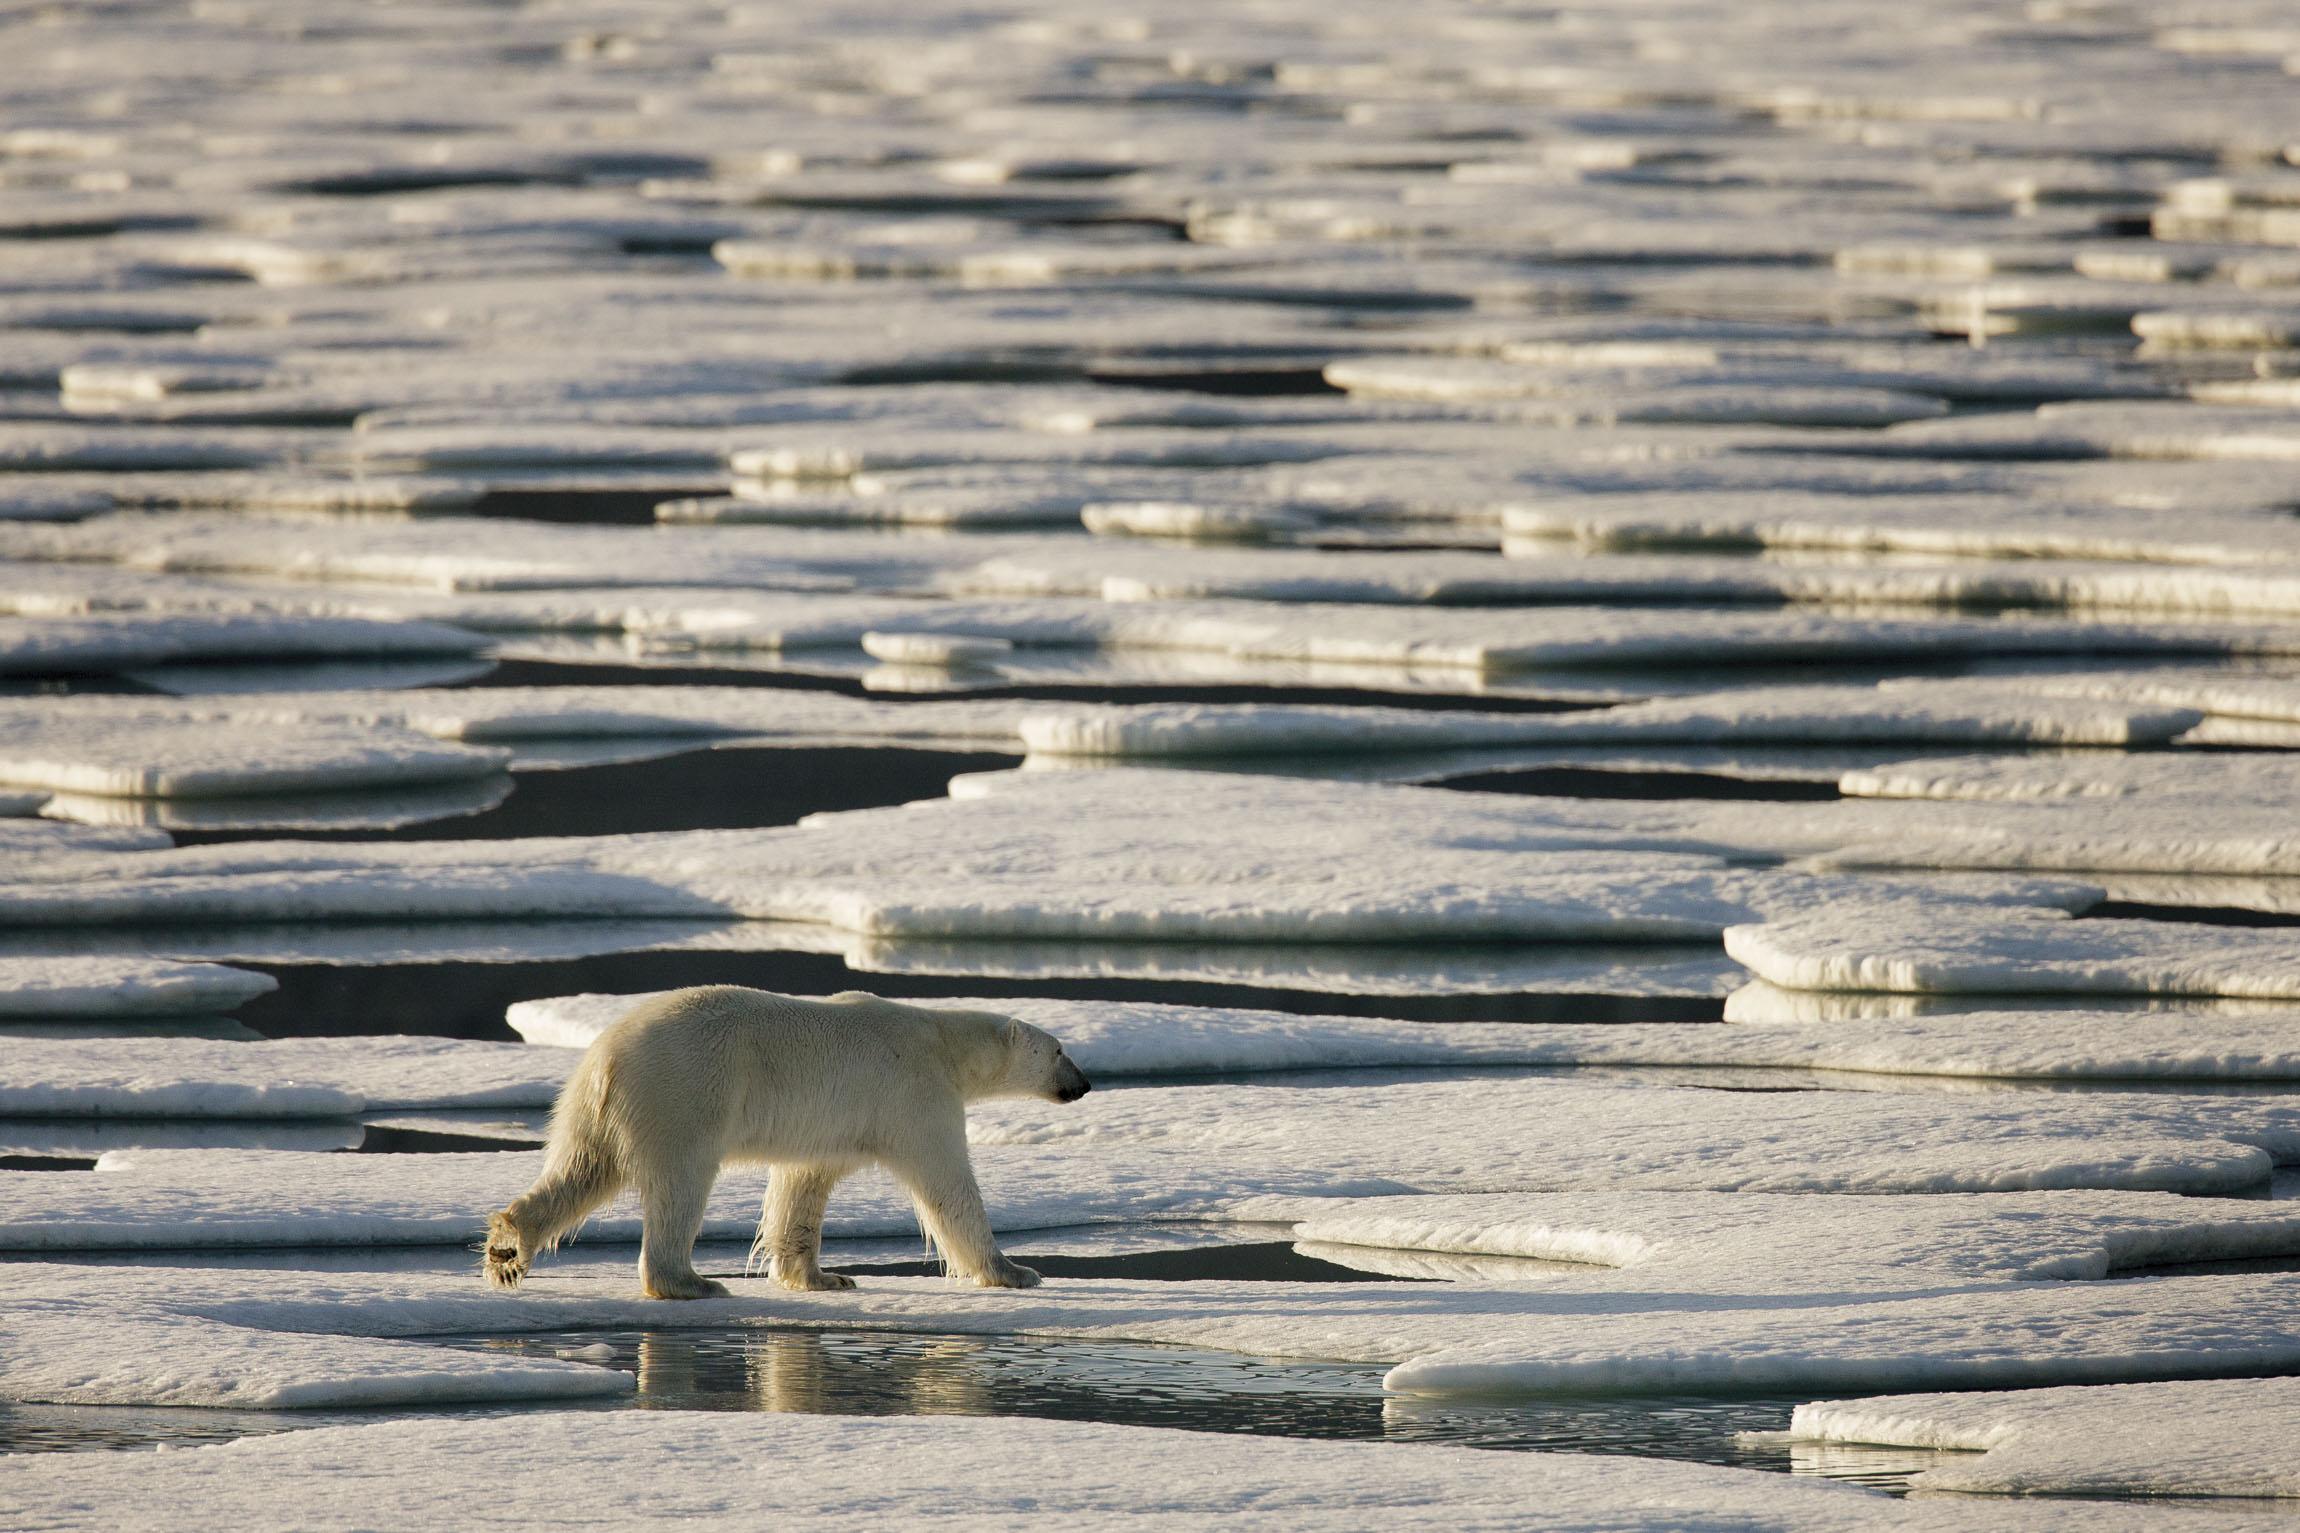 A polar bear walks around floes of sea ice